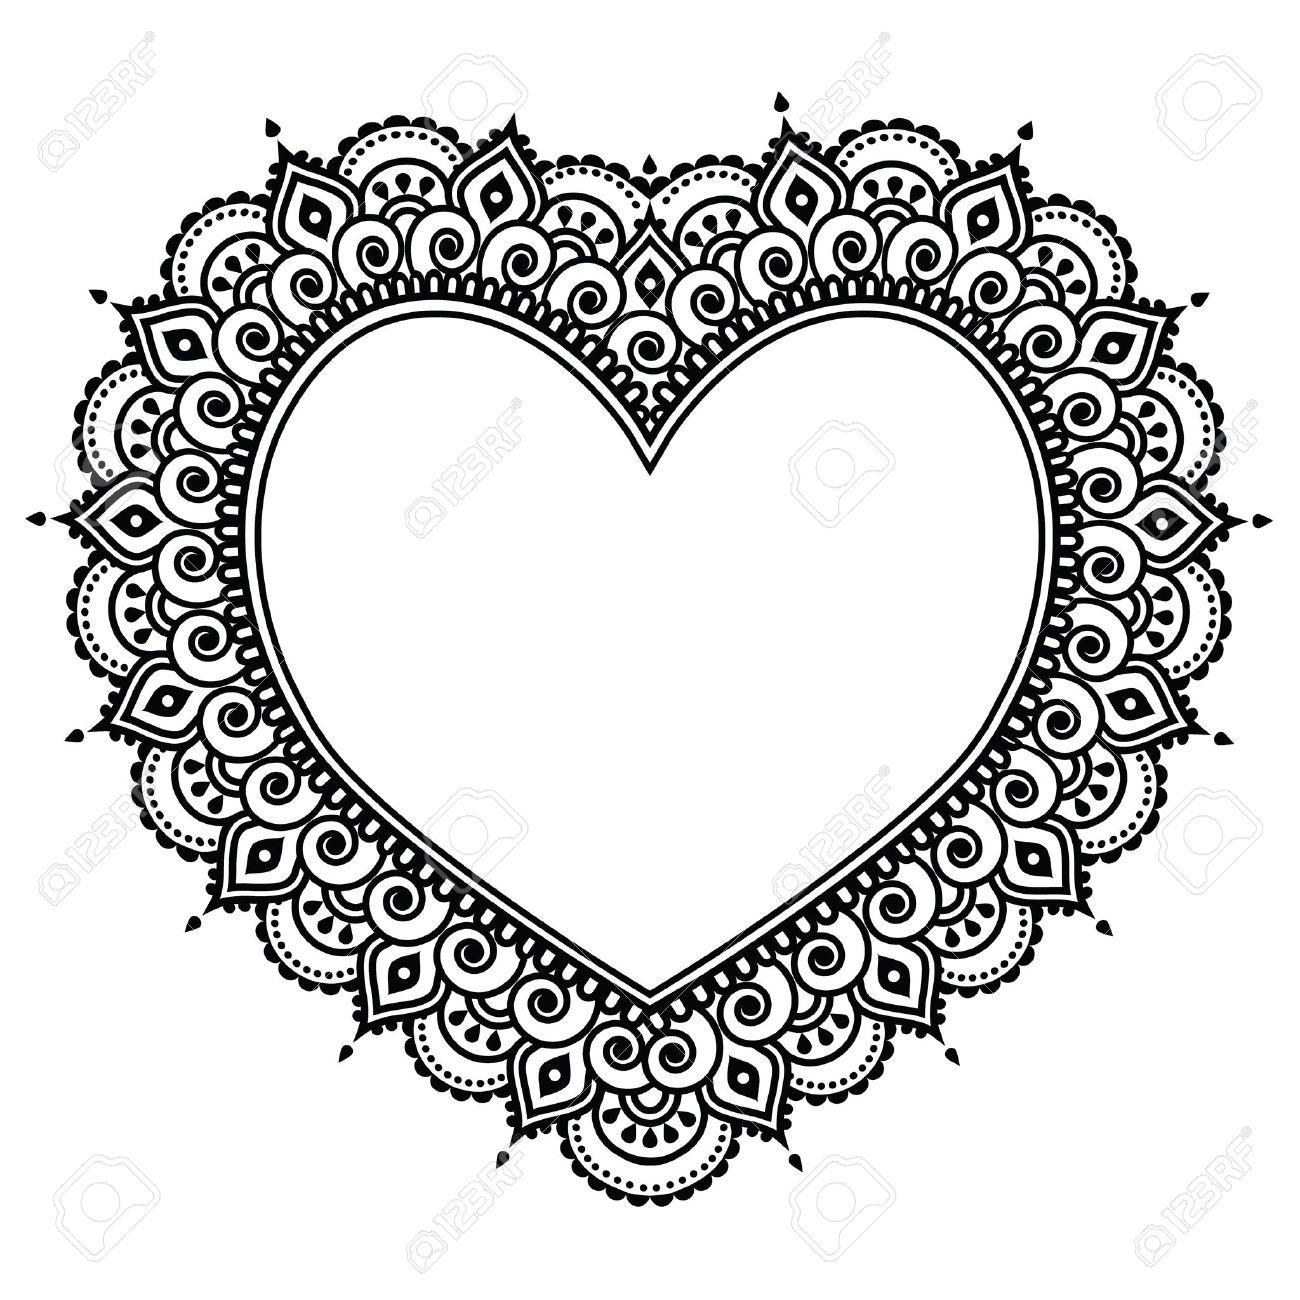 Heart Mehndi design, Indian Henna tattoo pattern - love concept - 45560545